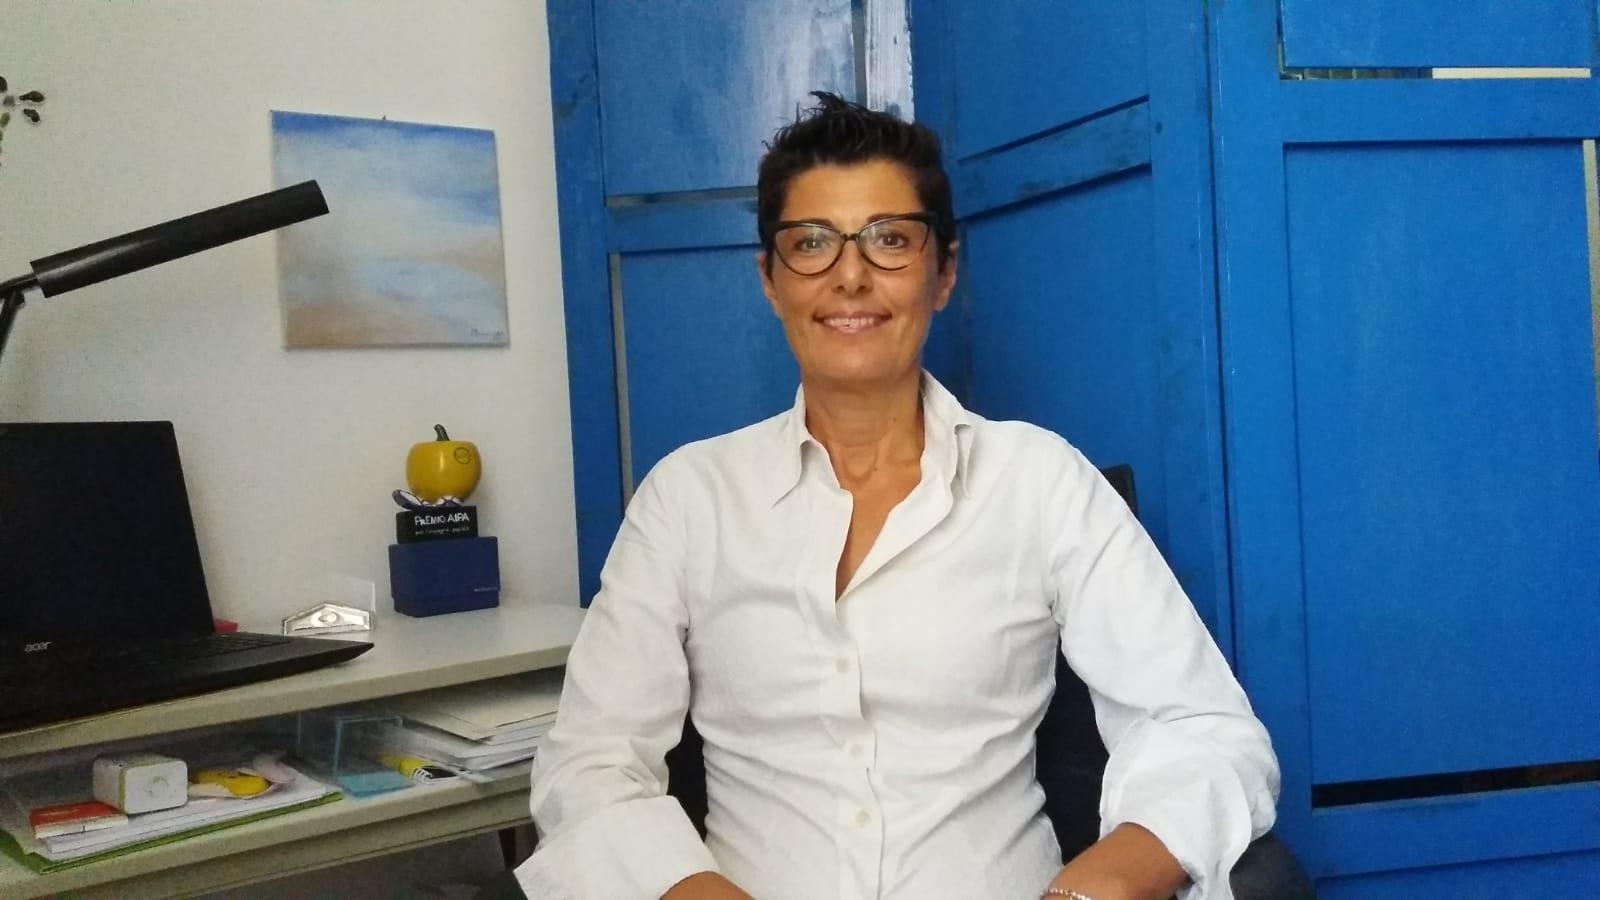 Dott.ssa Stefania Acquaro